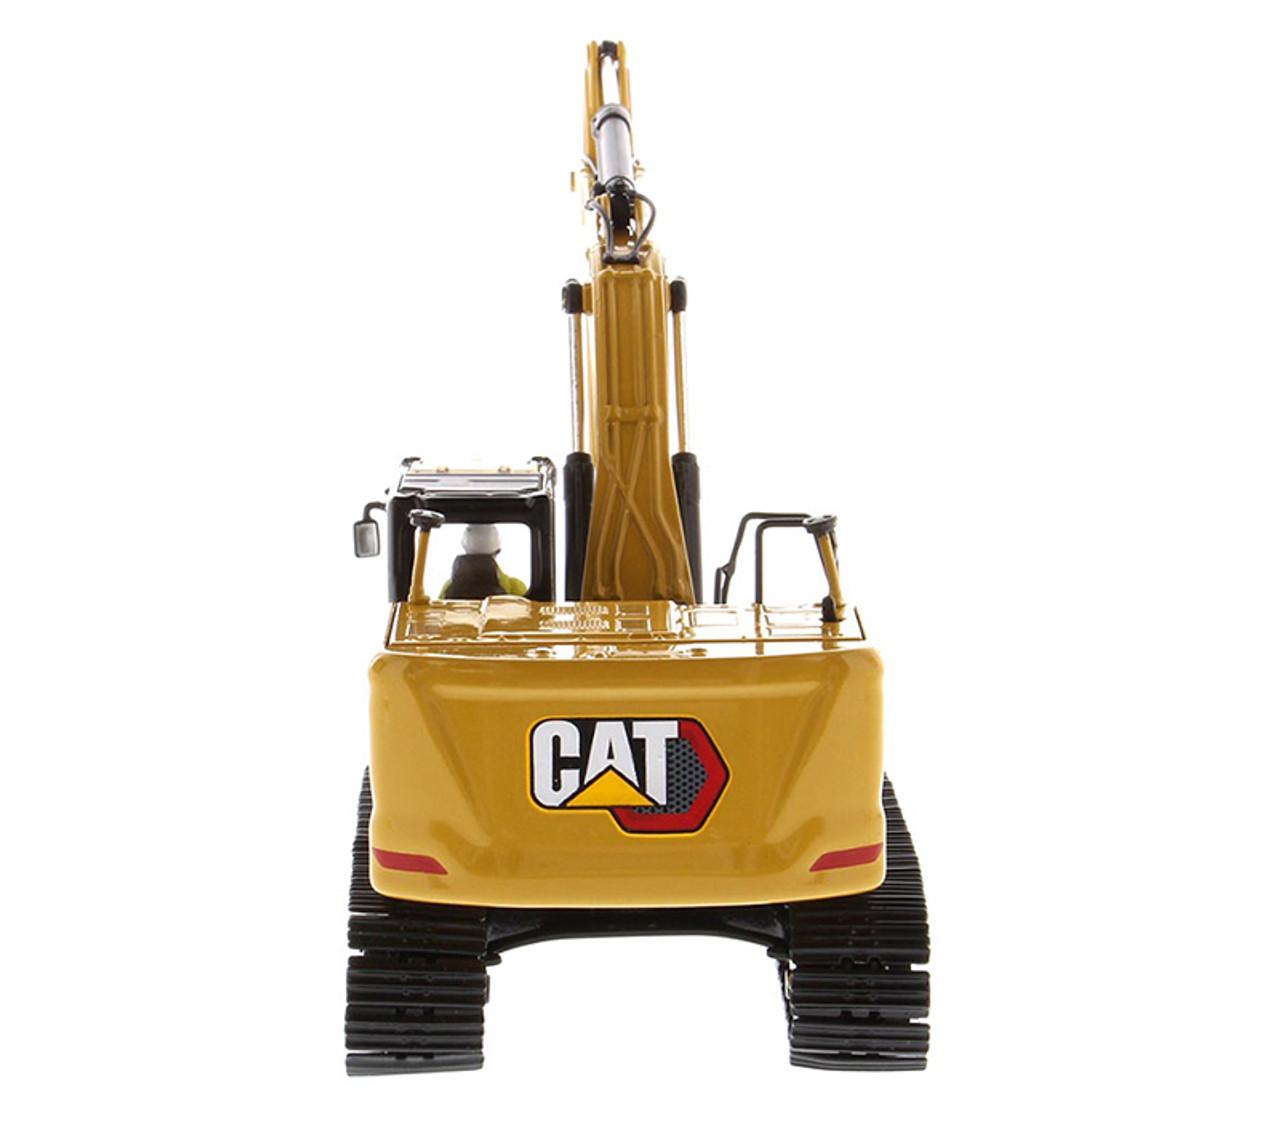 Caterpillar 330 Hydraulic Excavator